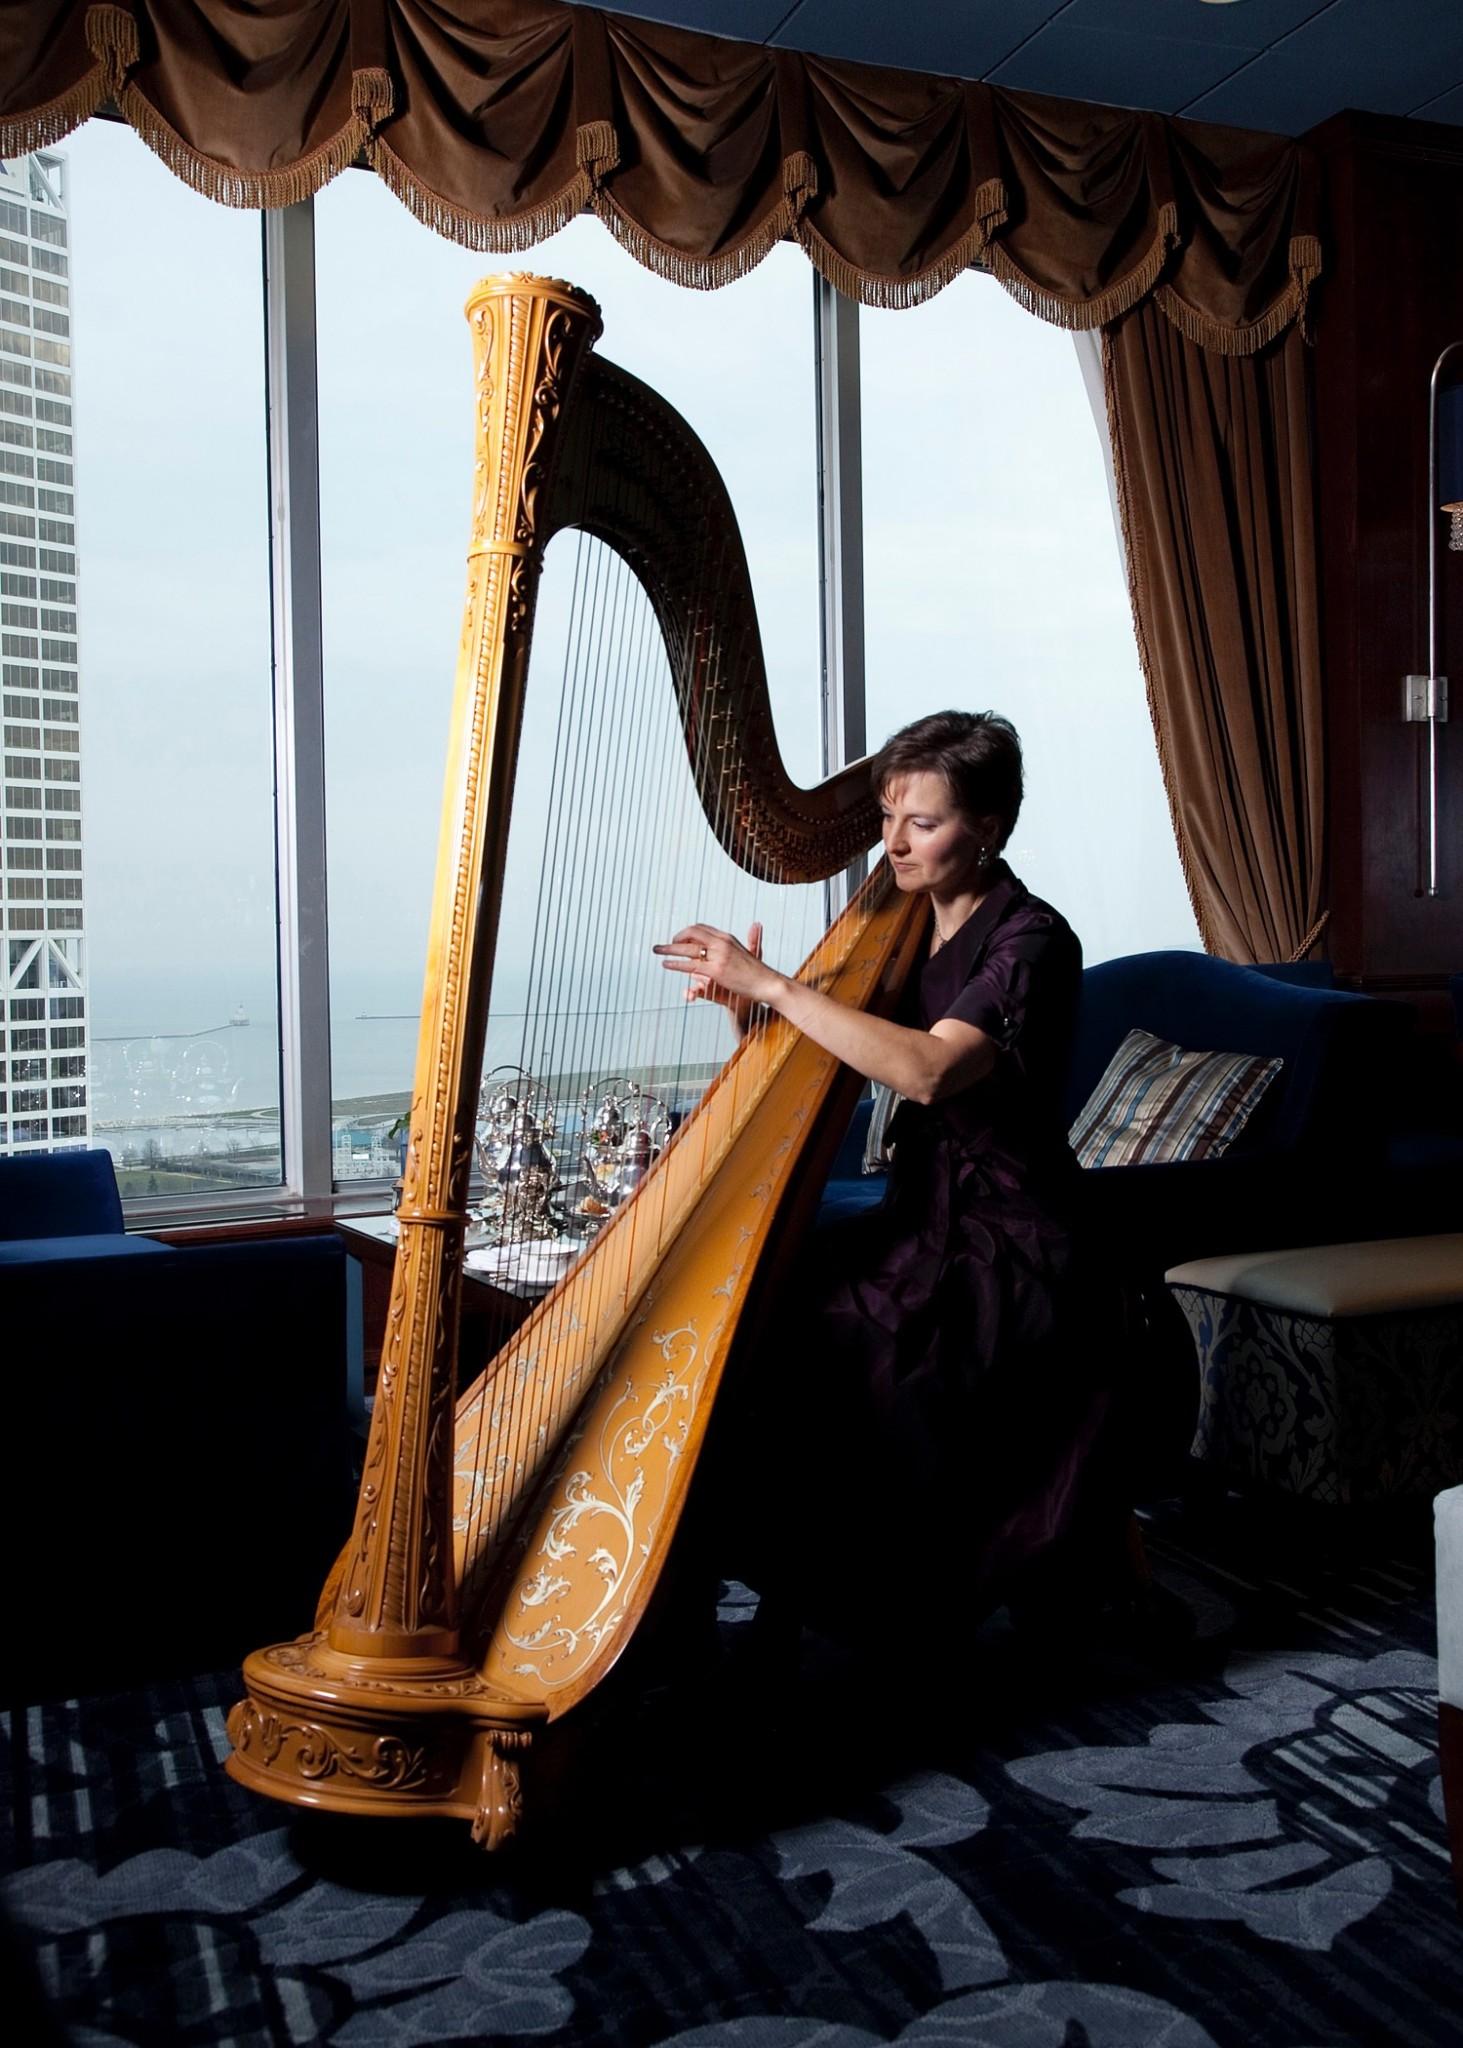 Harpist, Mary - ACA Entertainment : ACA Entertainment